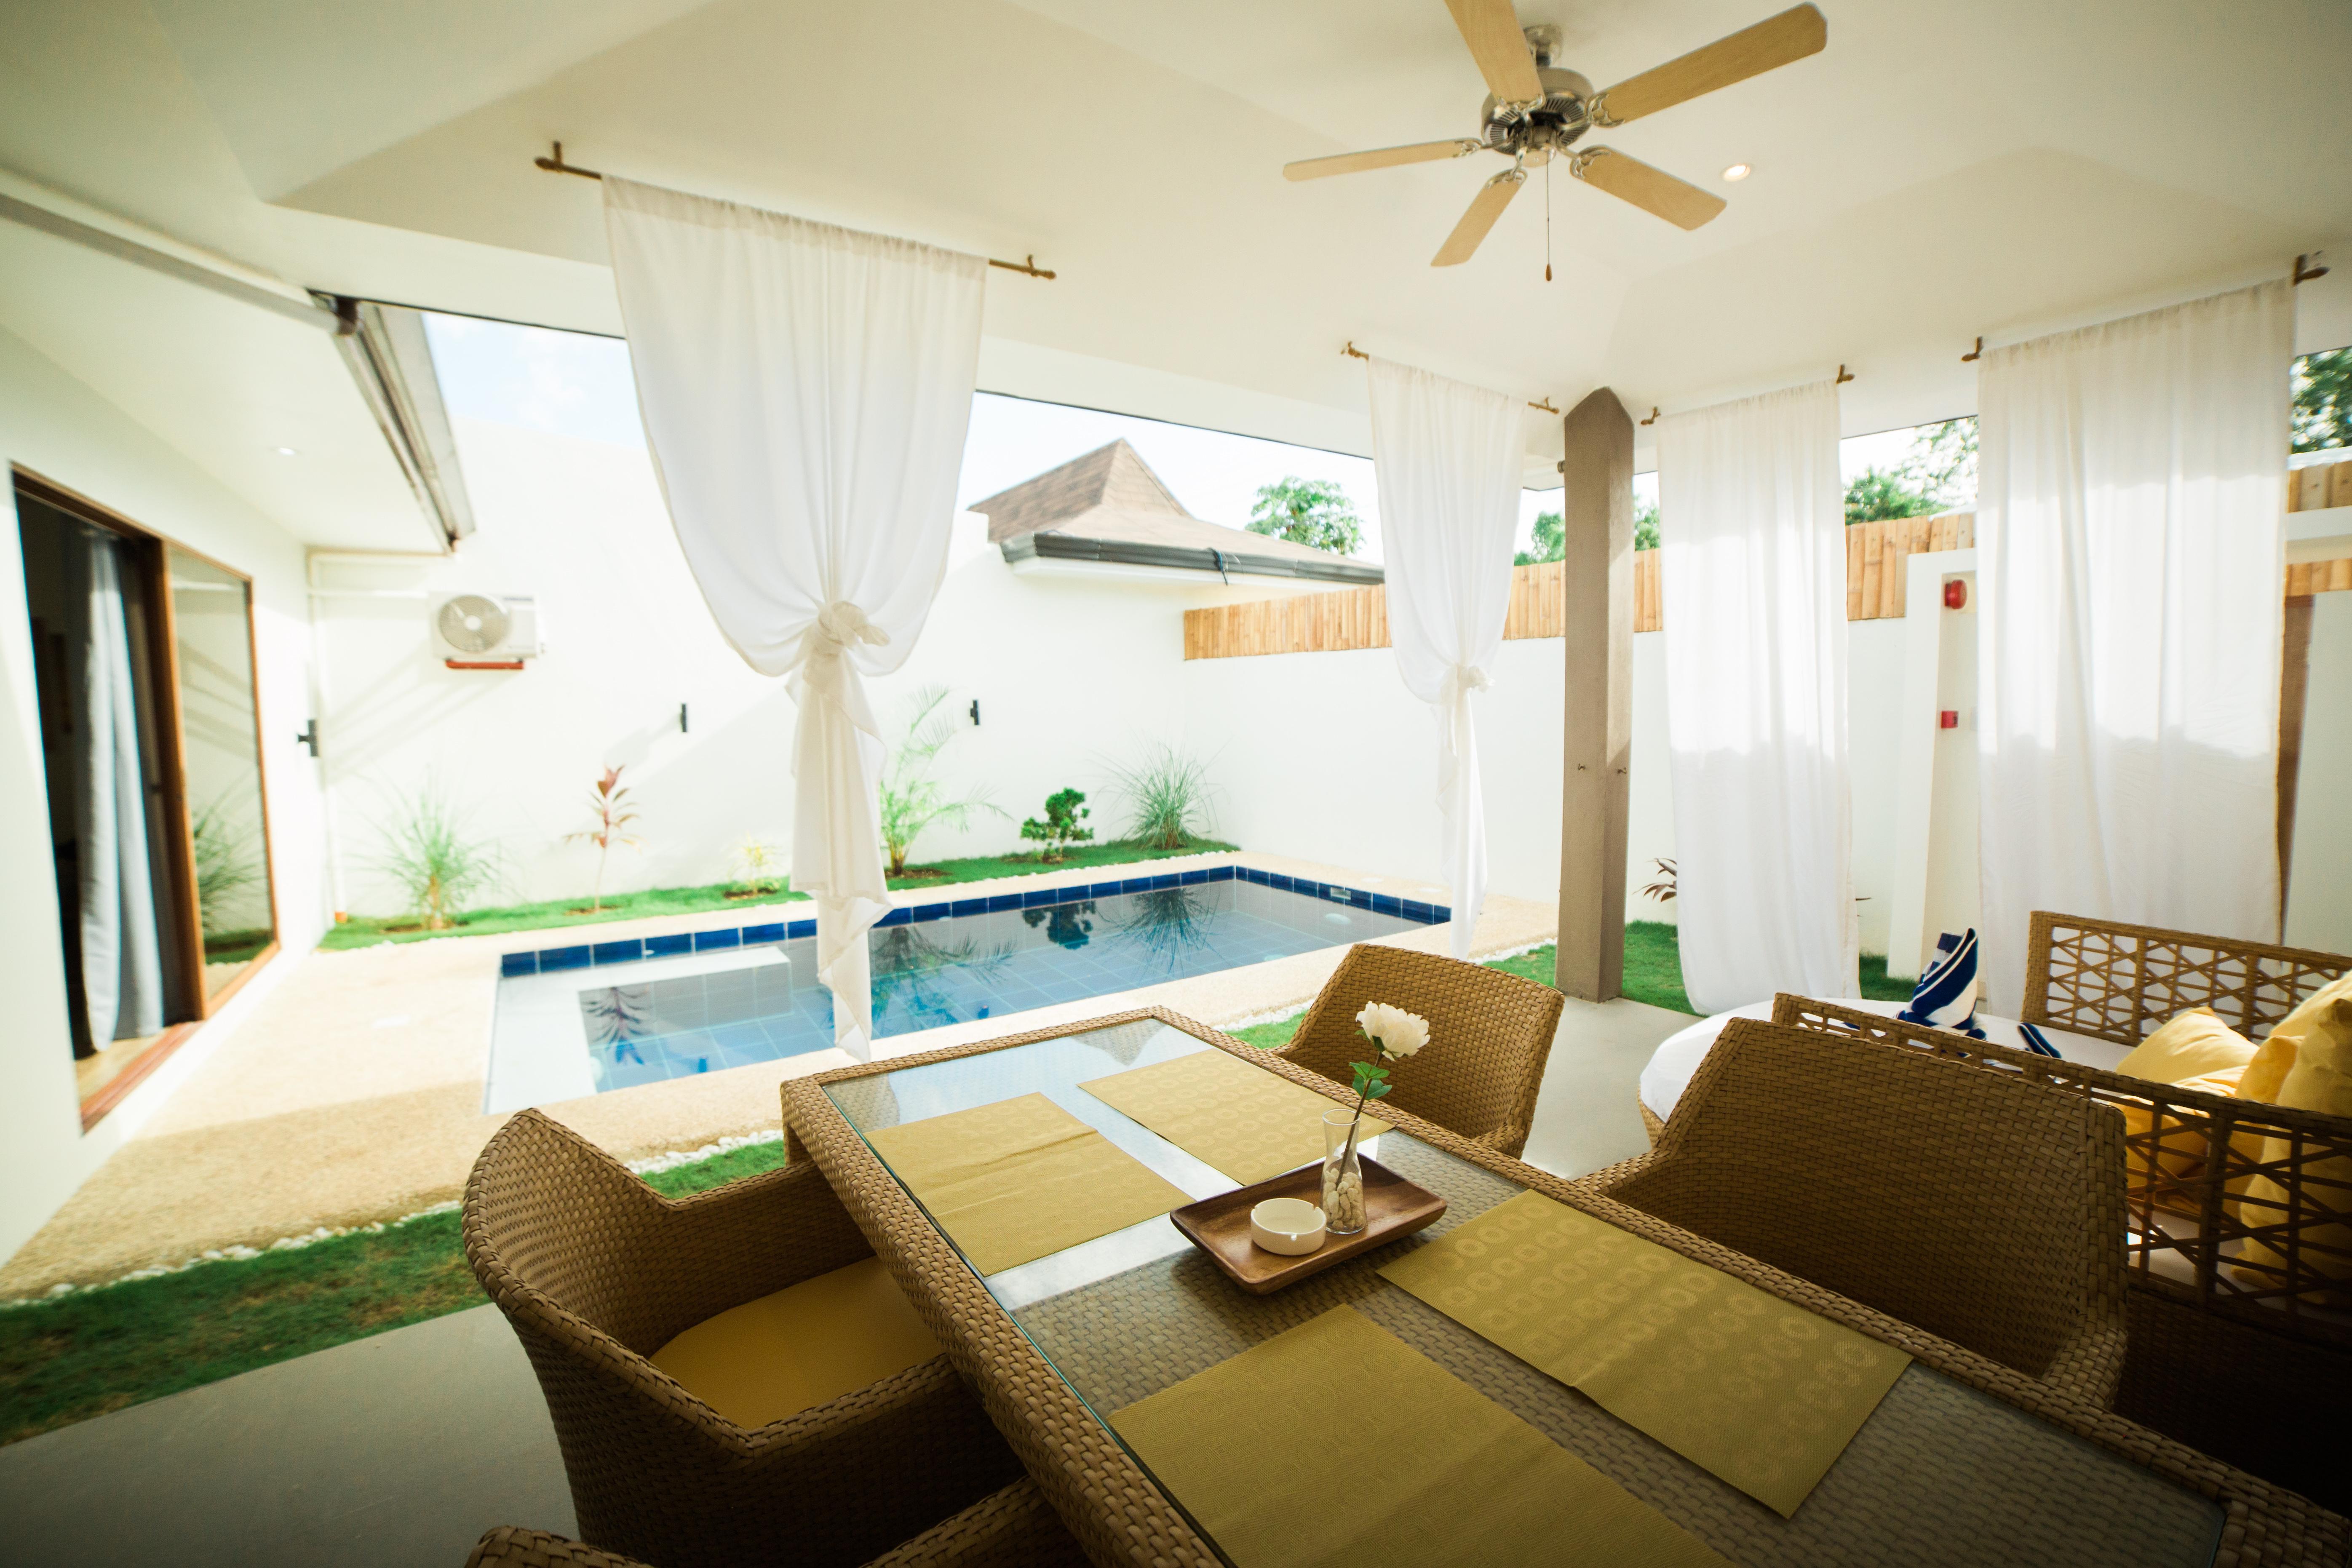 Bali Villas Panglao Bohol Villa 2 Villas For Rent In Panglao Central Visayas Philippines